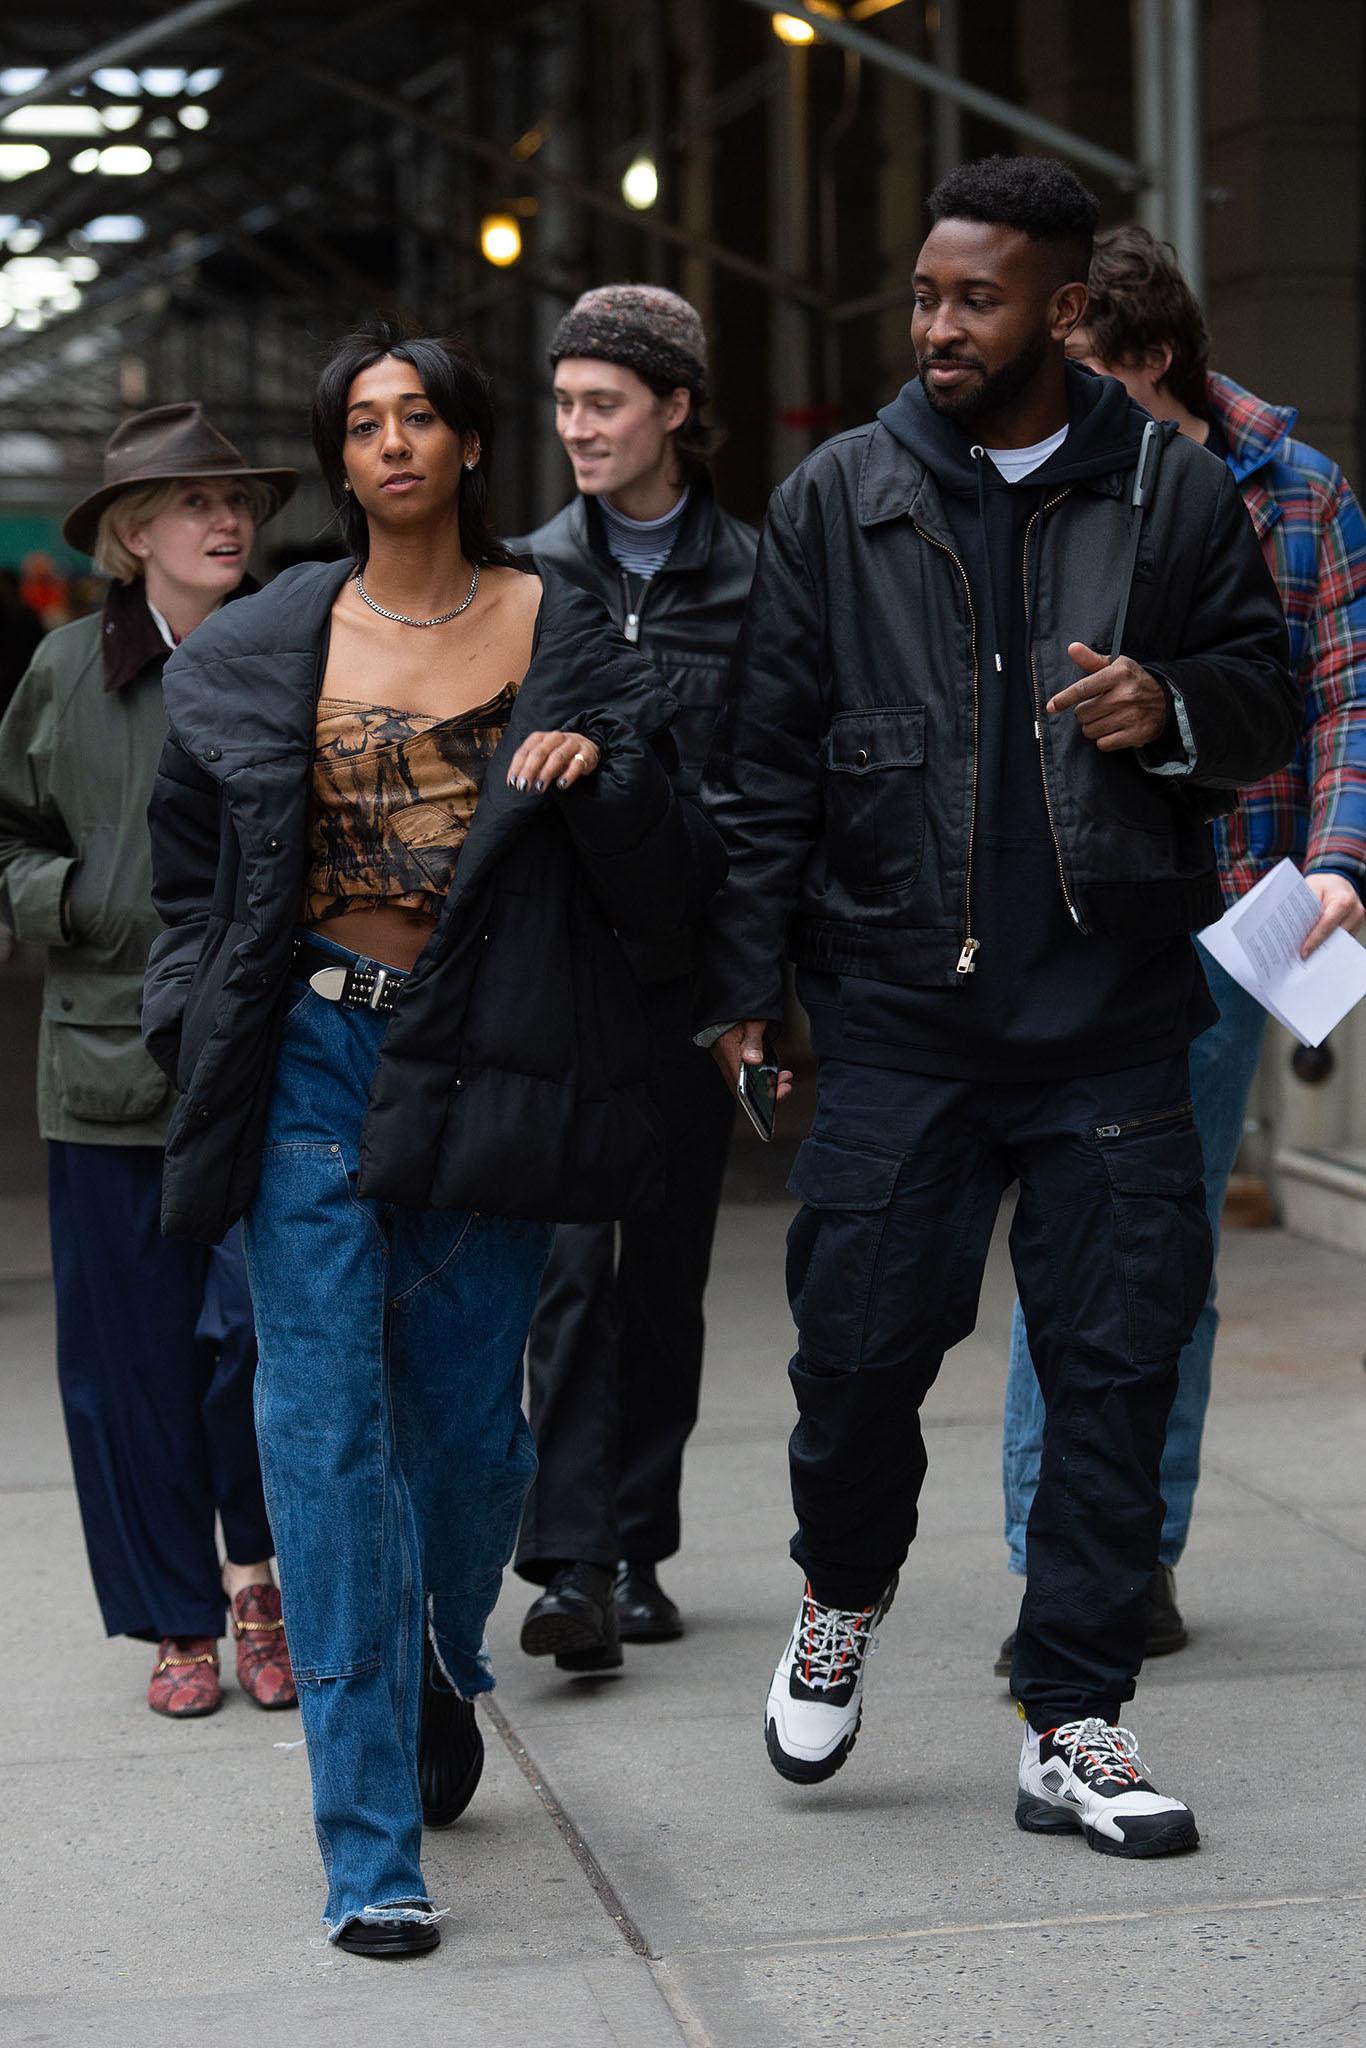 Streetstyle at New York Fashion Week Men's Fall 2020.